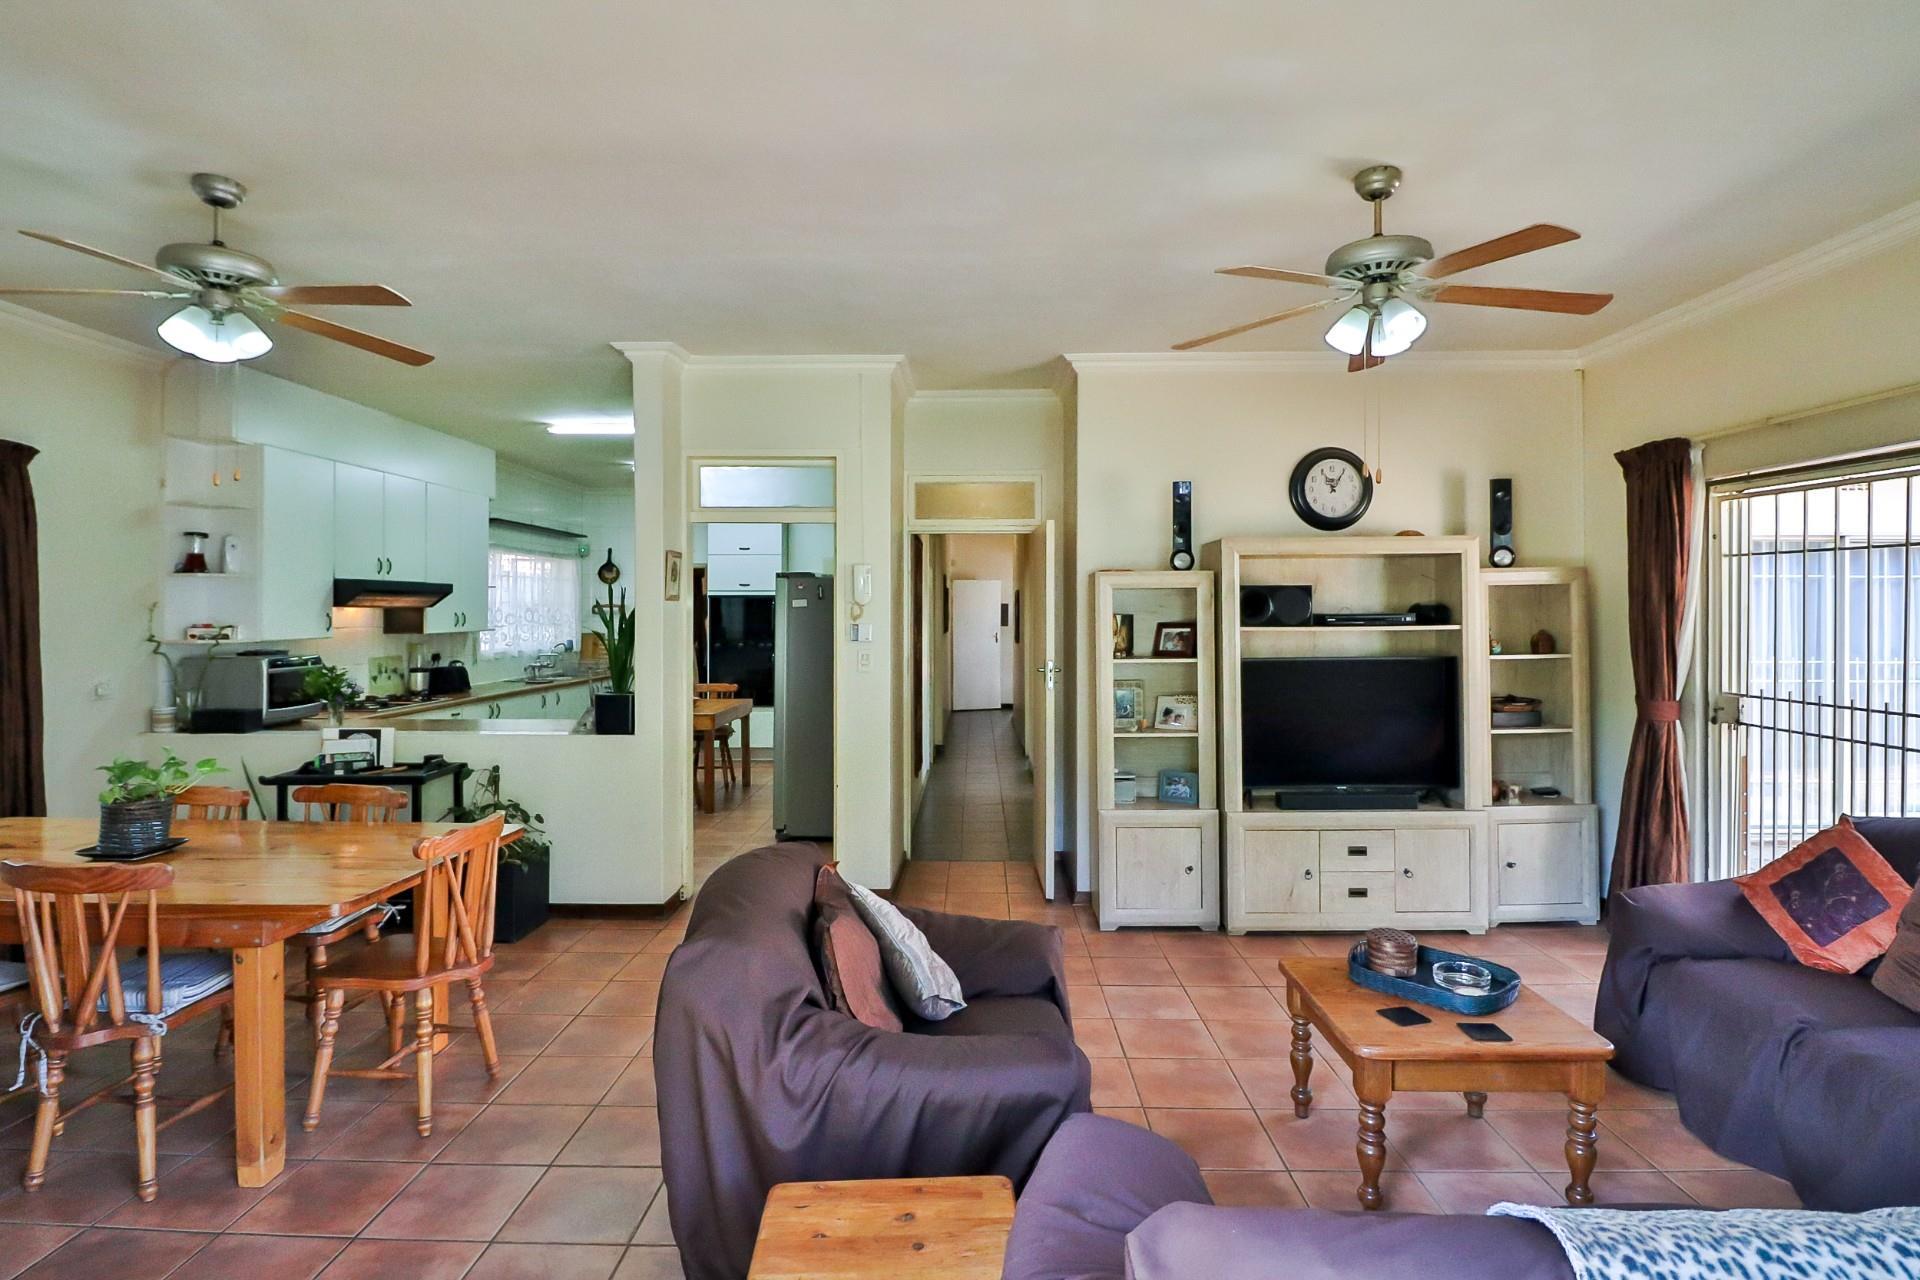 6 Bedroom House For Sale in Linden